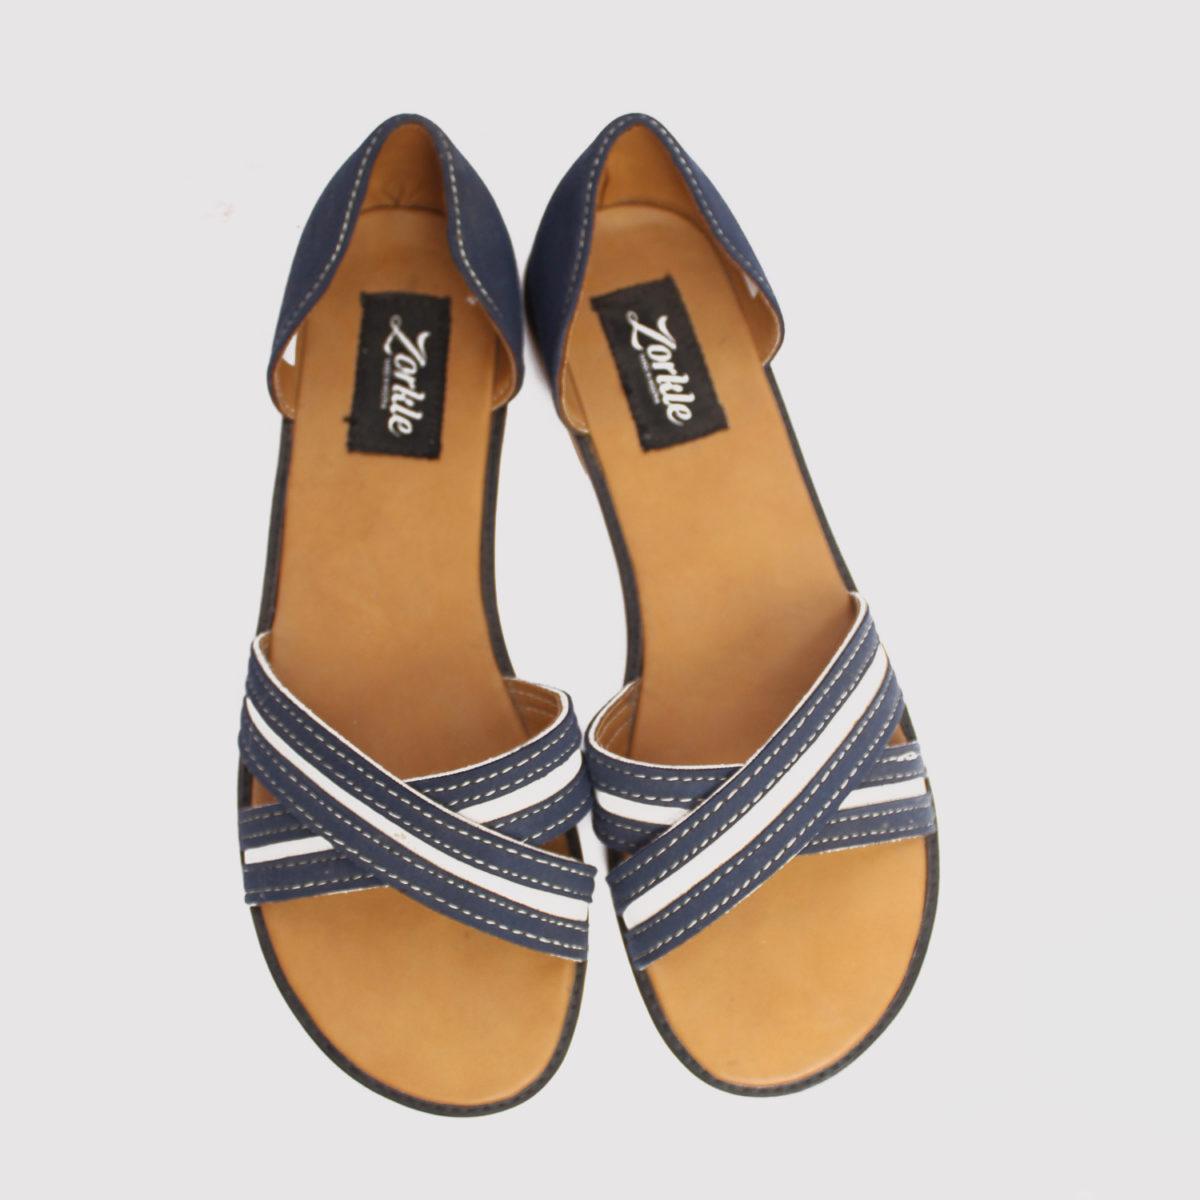 Kisha crisscross sandals blue white leather zorkle shoes in lagos nigeria